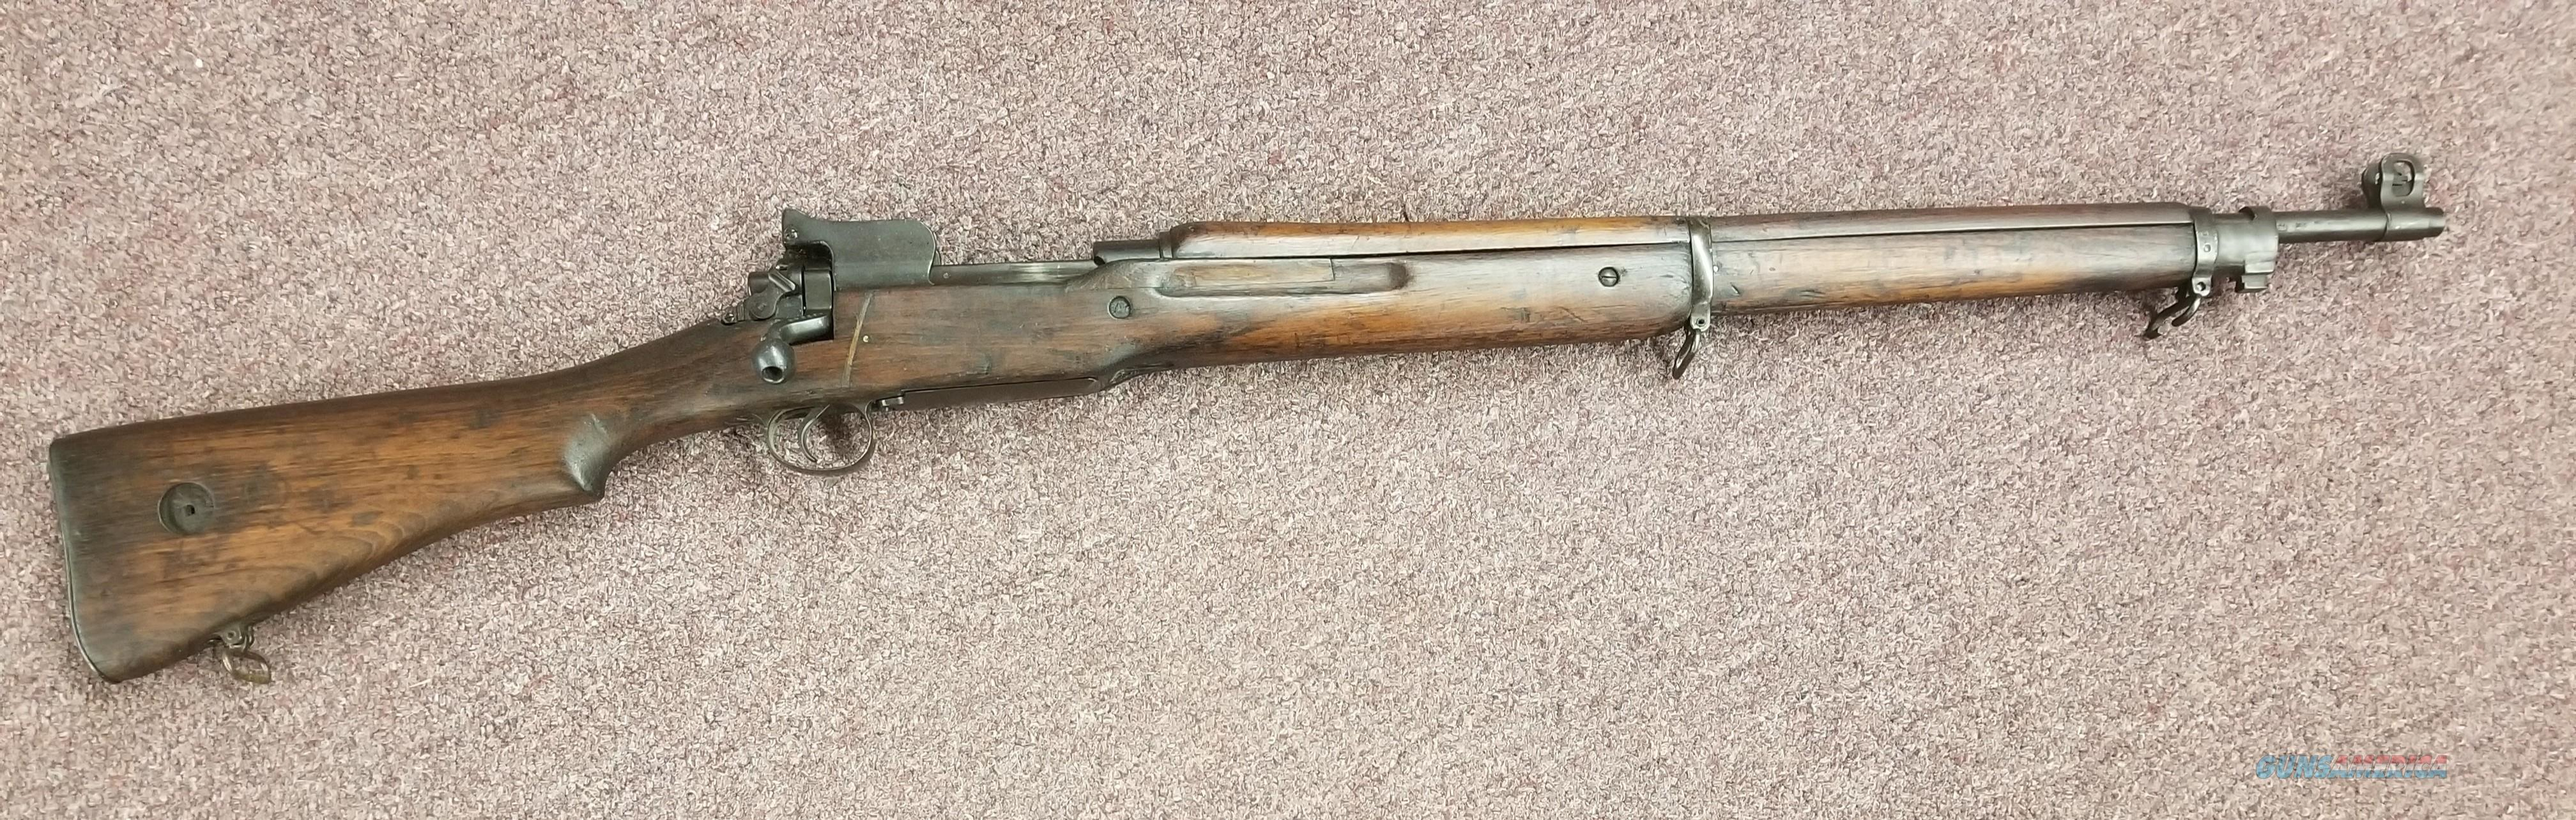 Enfield P14 - ERA - 303 British - Free Shipping !!  Guns > Rifles > Military Misc. Rifles US > Model 1917 Variants